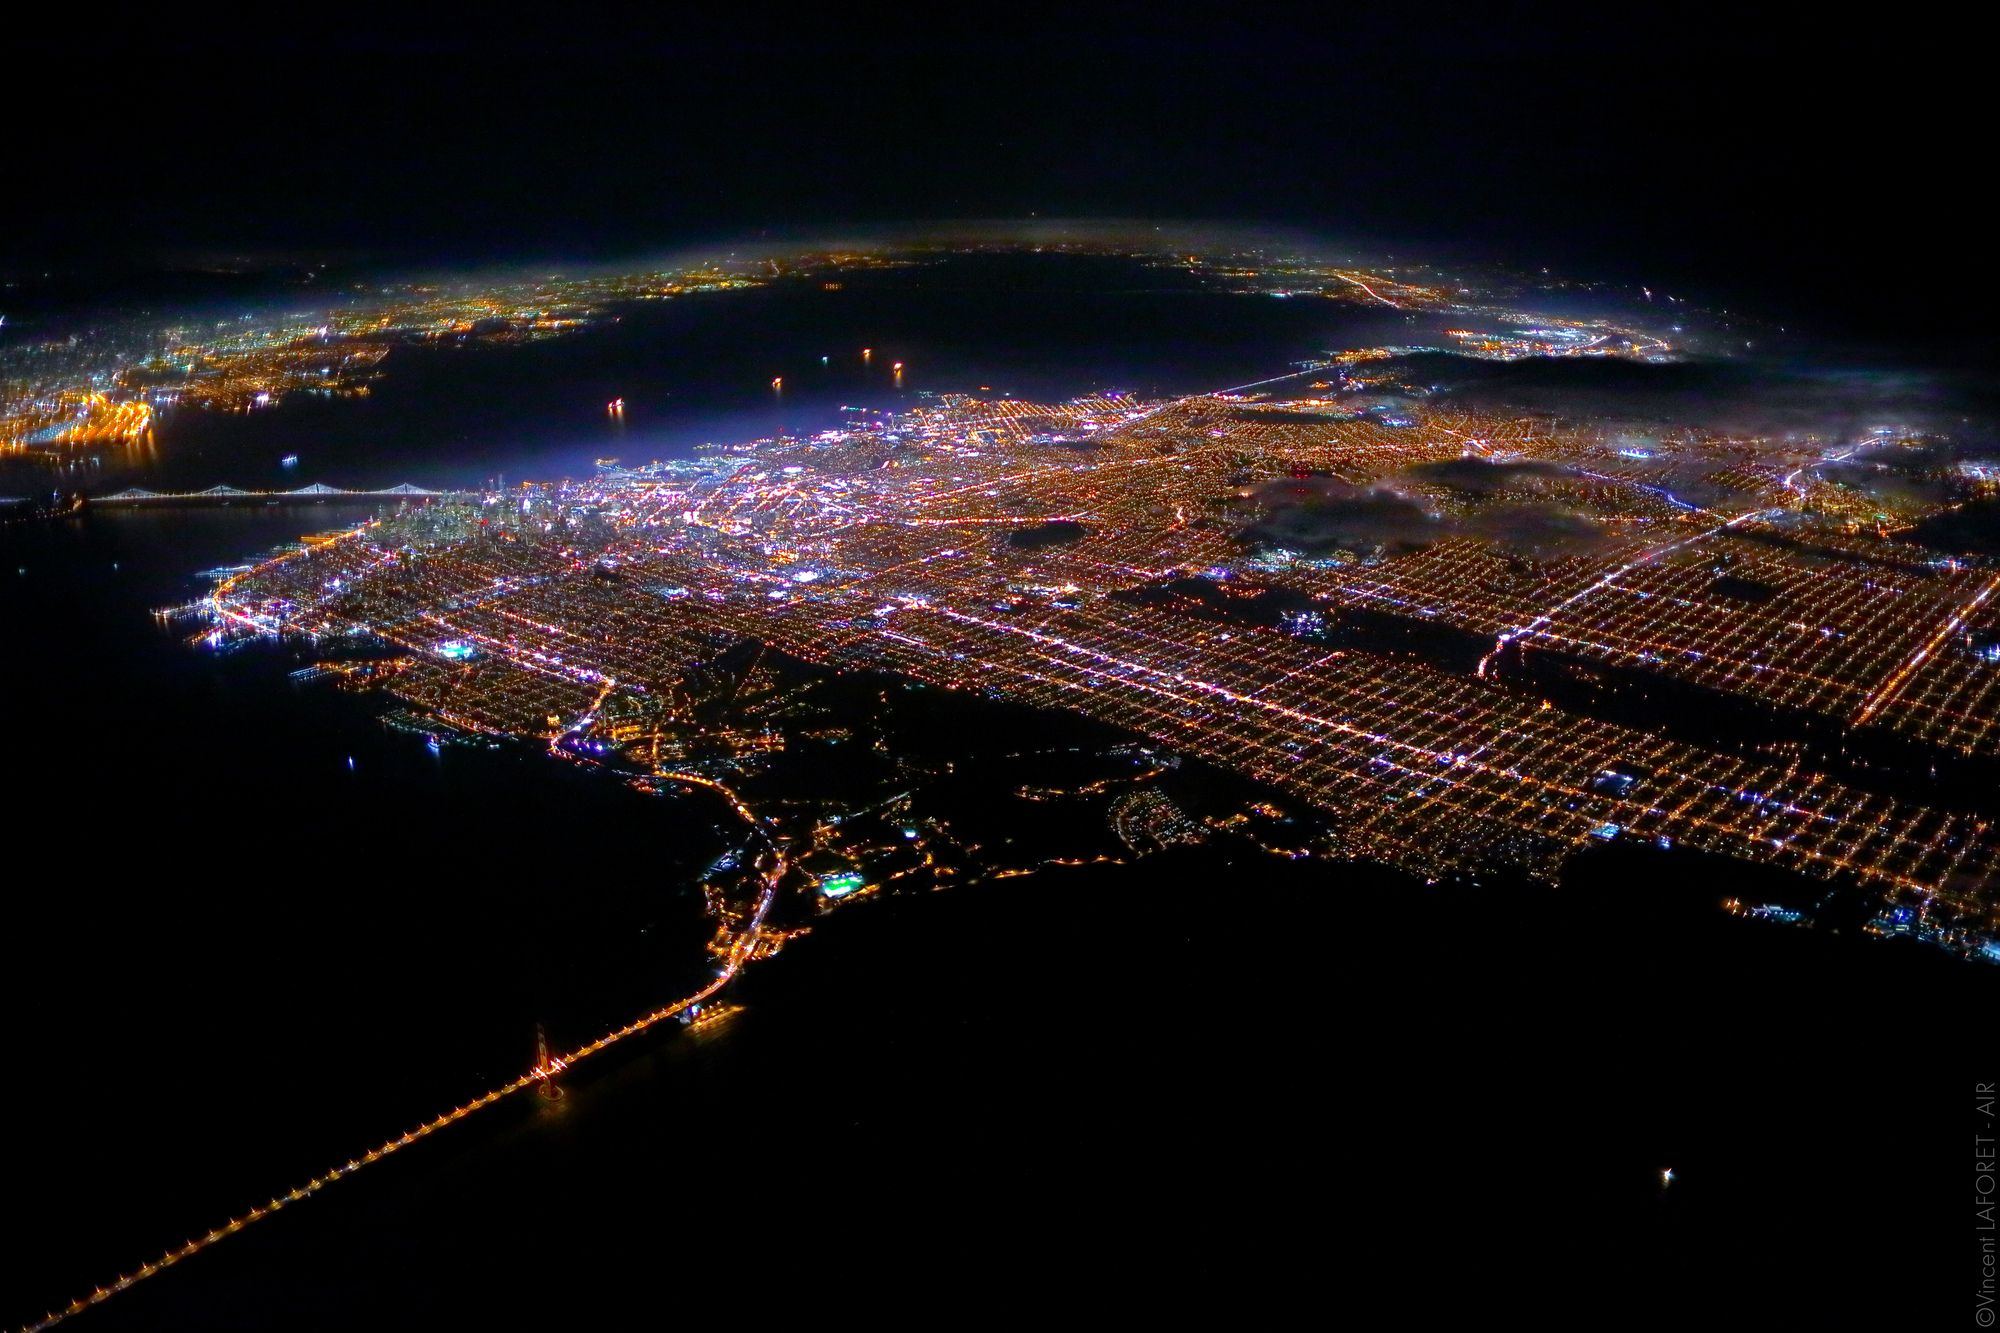 550b1f6ae58eceb2700000ef_vincent-laforet-captures-san-francisco-from-above_01_vbl_35a0814.jpg 2000×1333 pixels